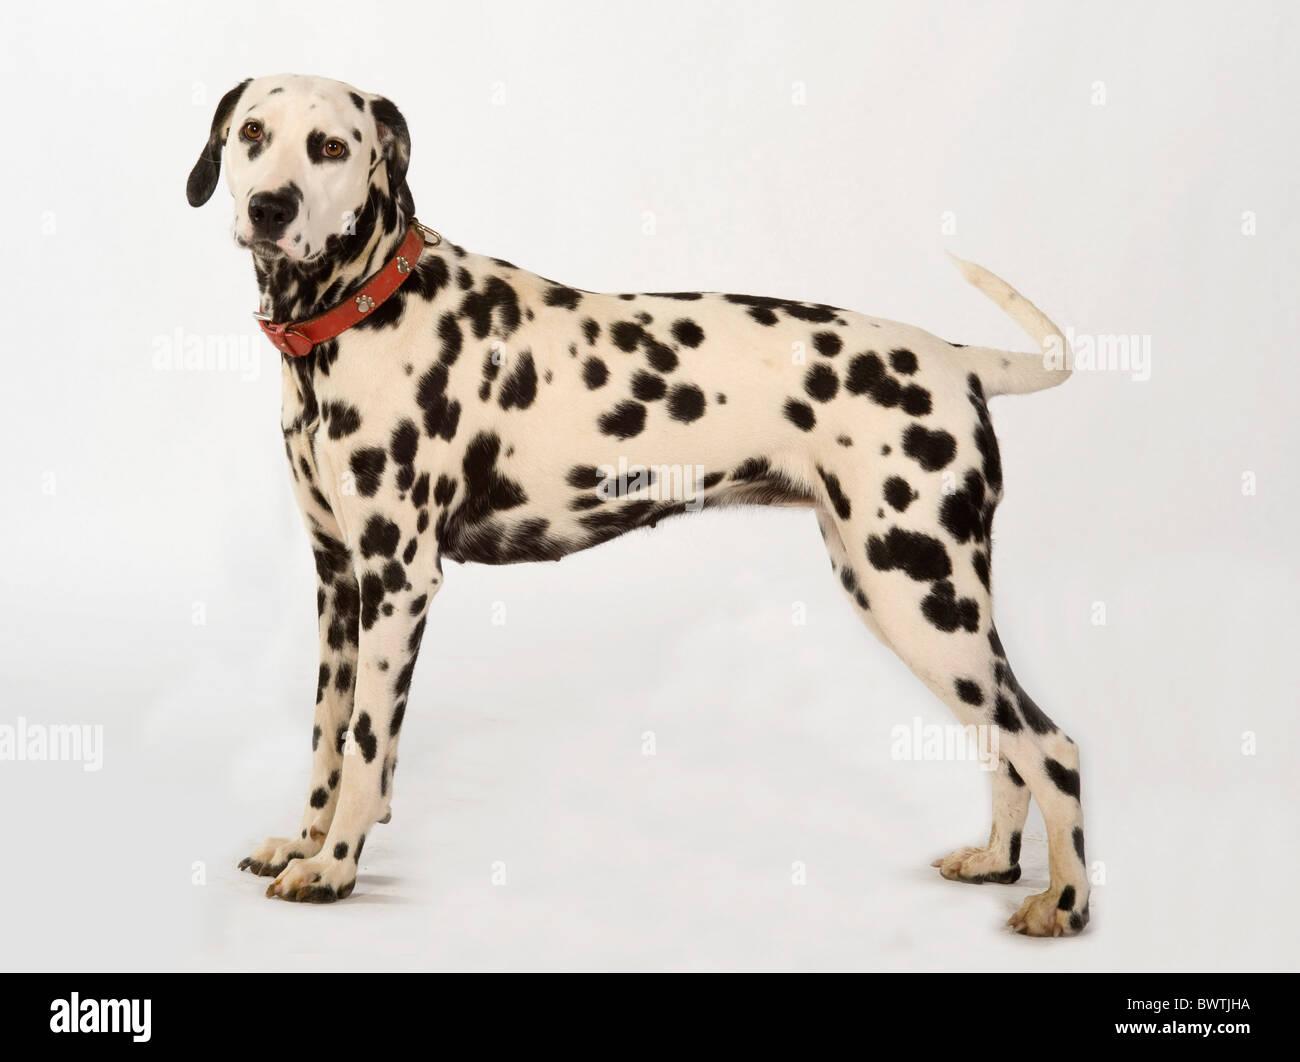 Dalmatian Dog UK in studio - Stock Image